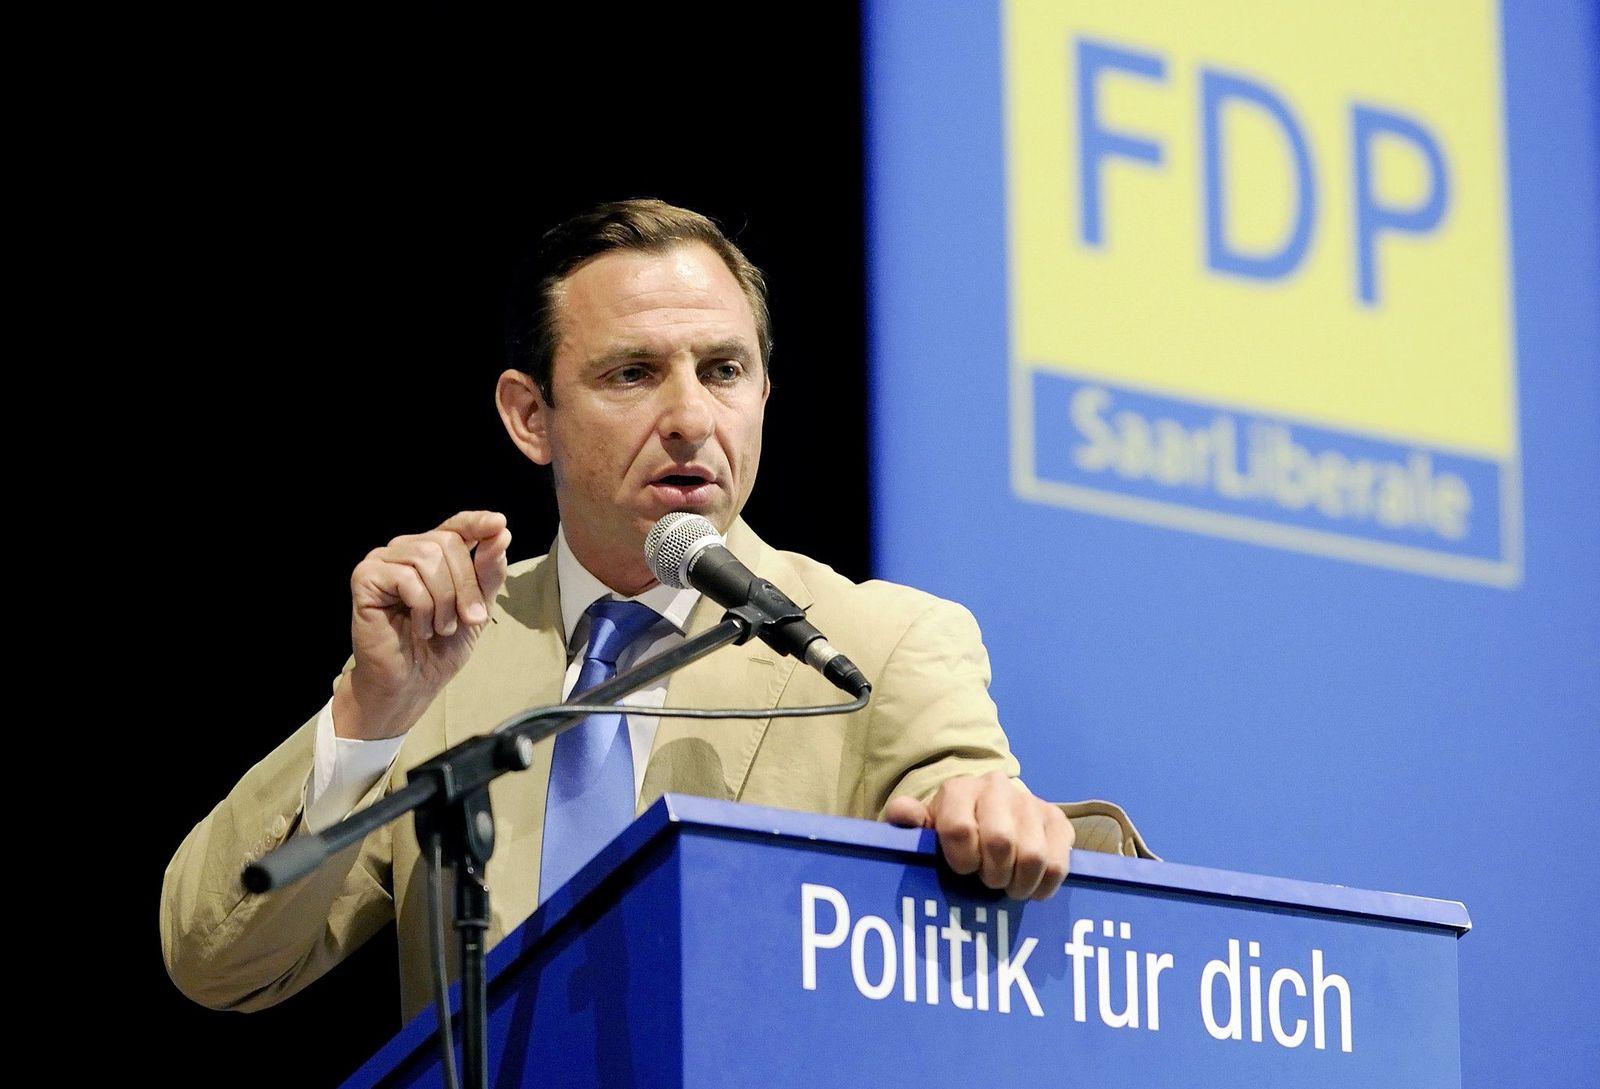 Jorgo Chatzimarkakis/ Landesparteitag/ Saarland/ FDP